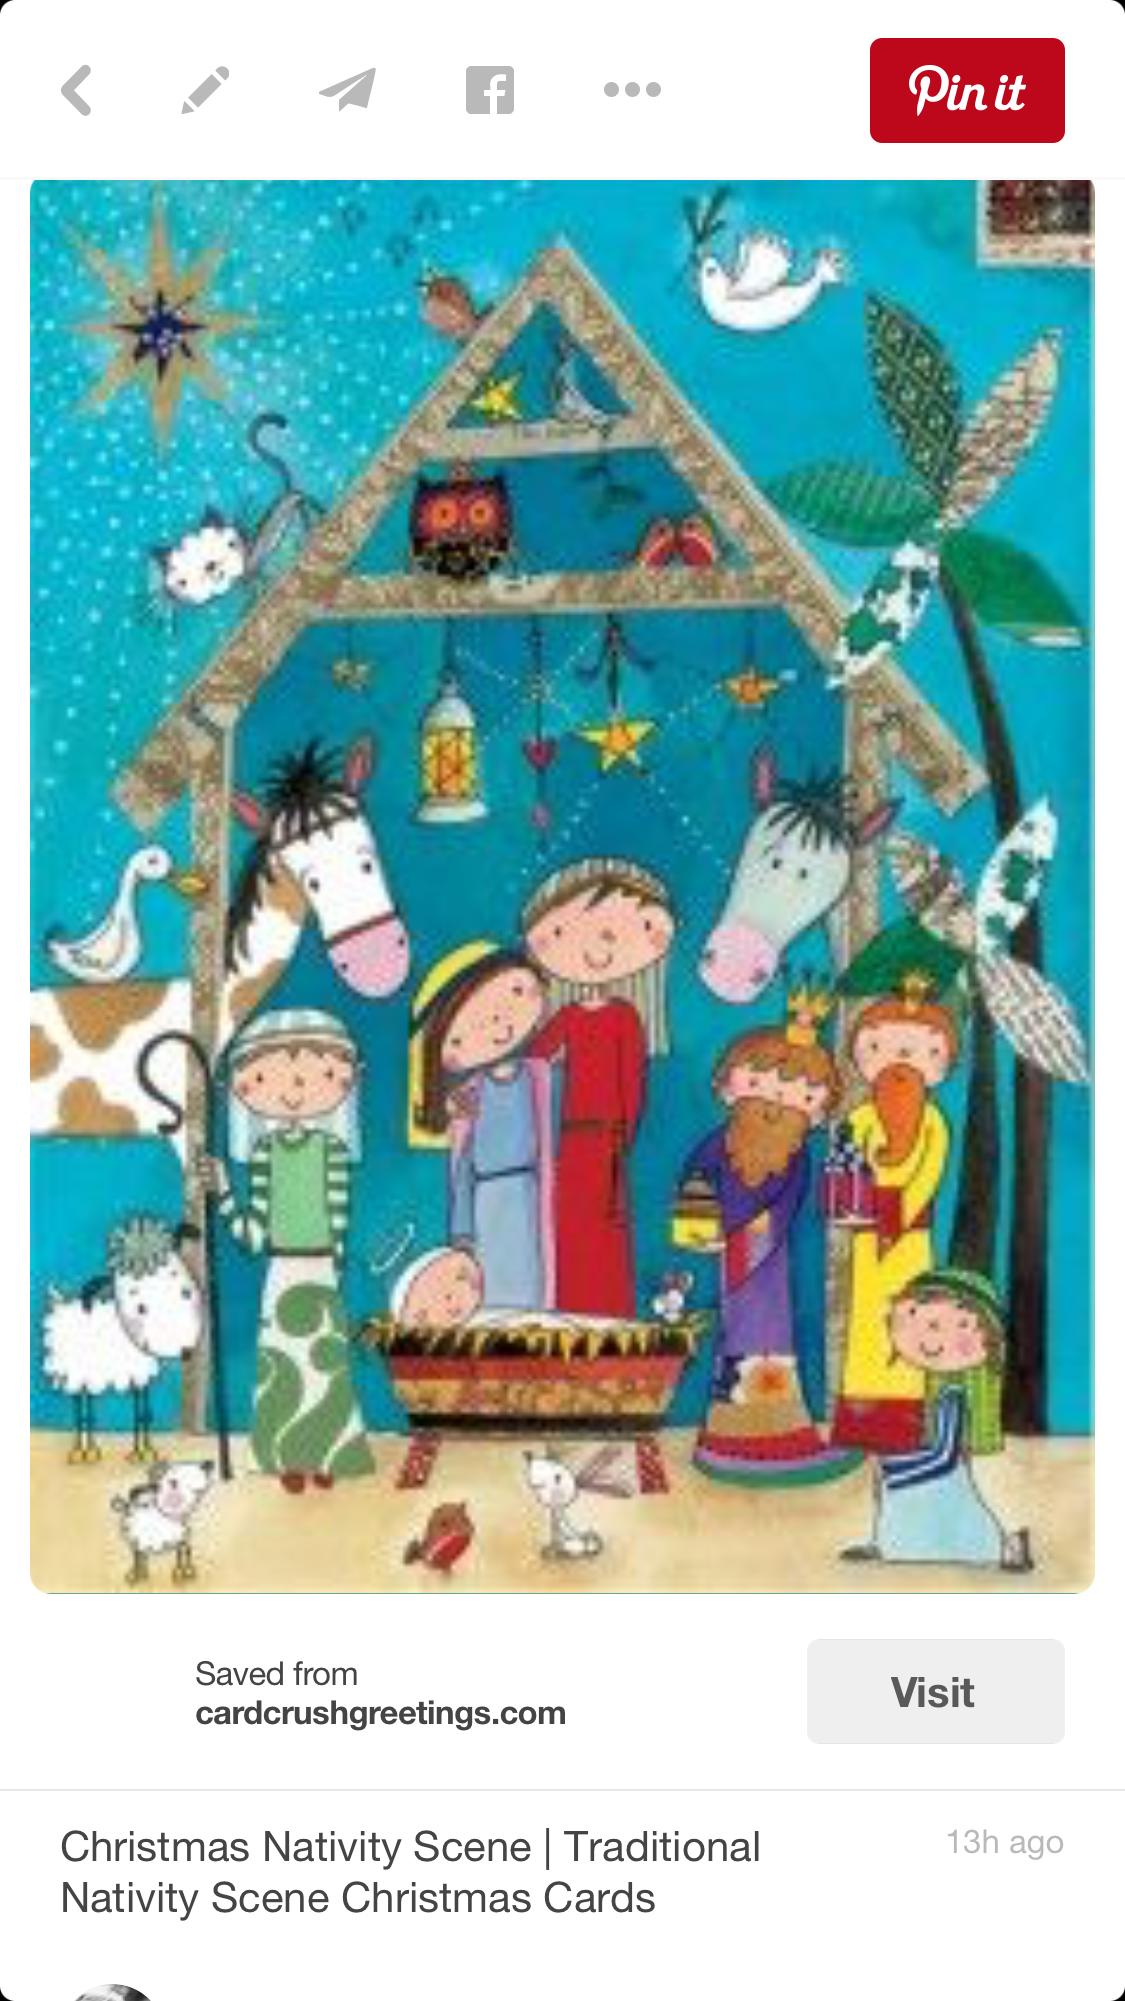 Pin by Mary Wenske on Catholic school | Pinterest | Nativity ...